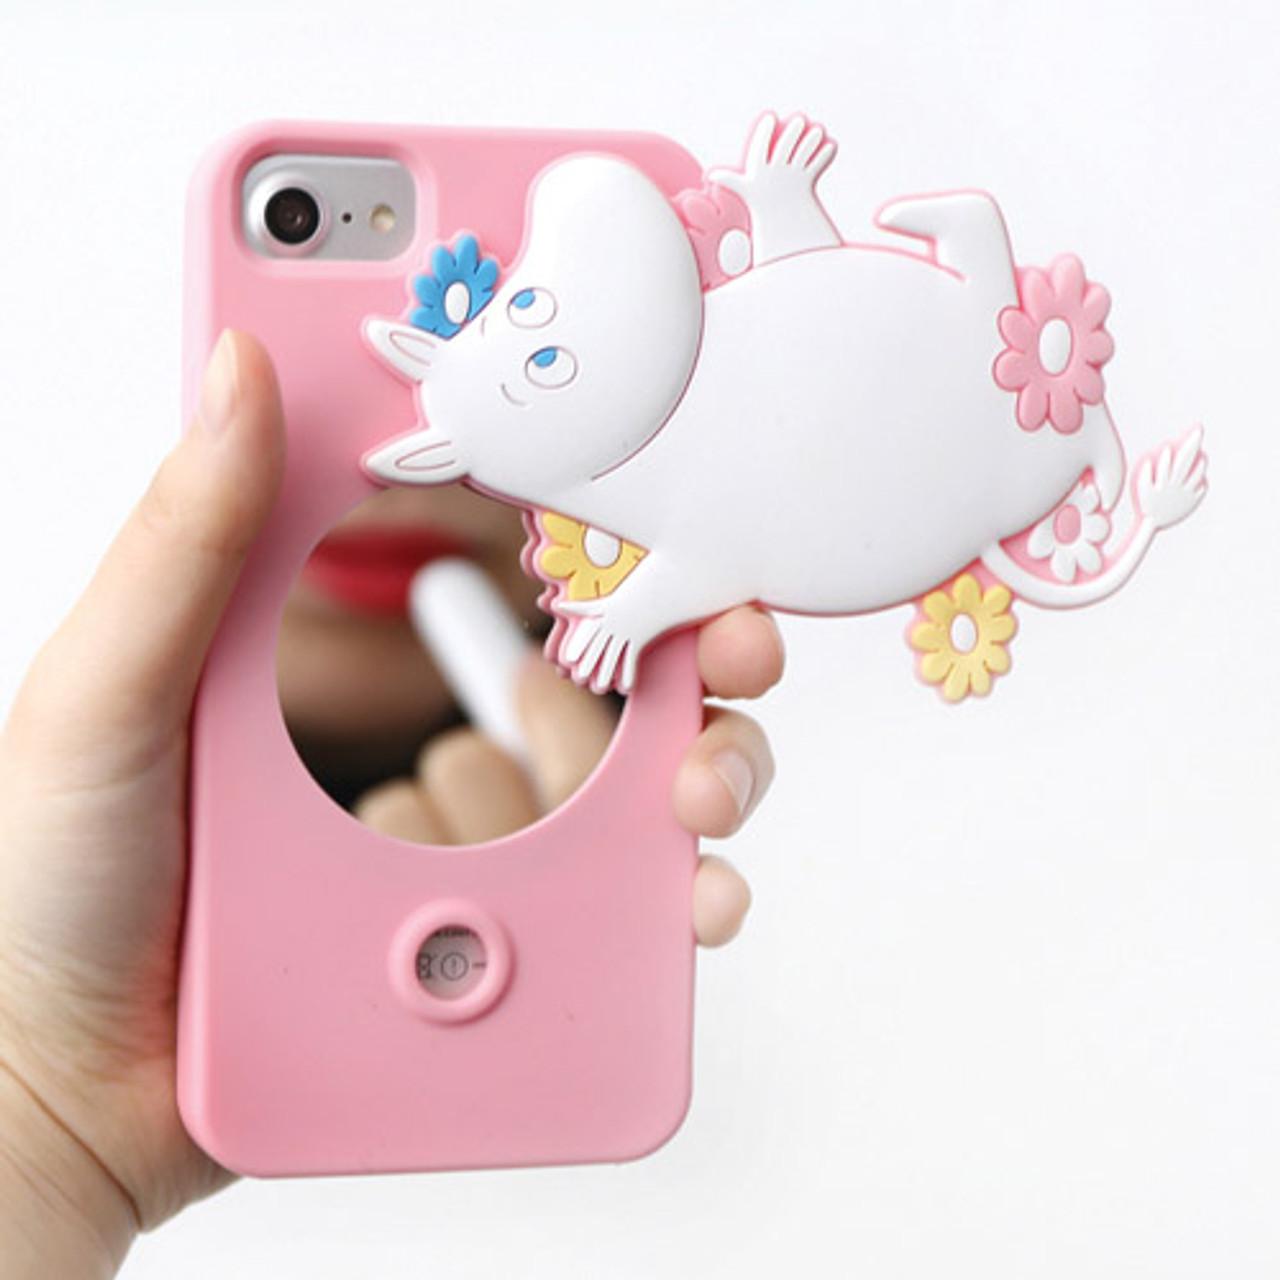 Moomin Iphone S Case